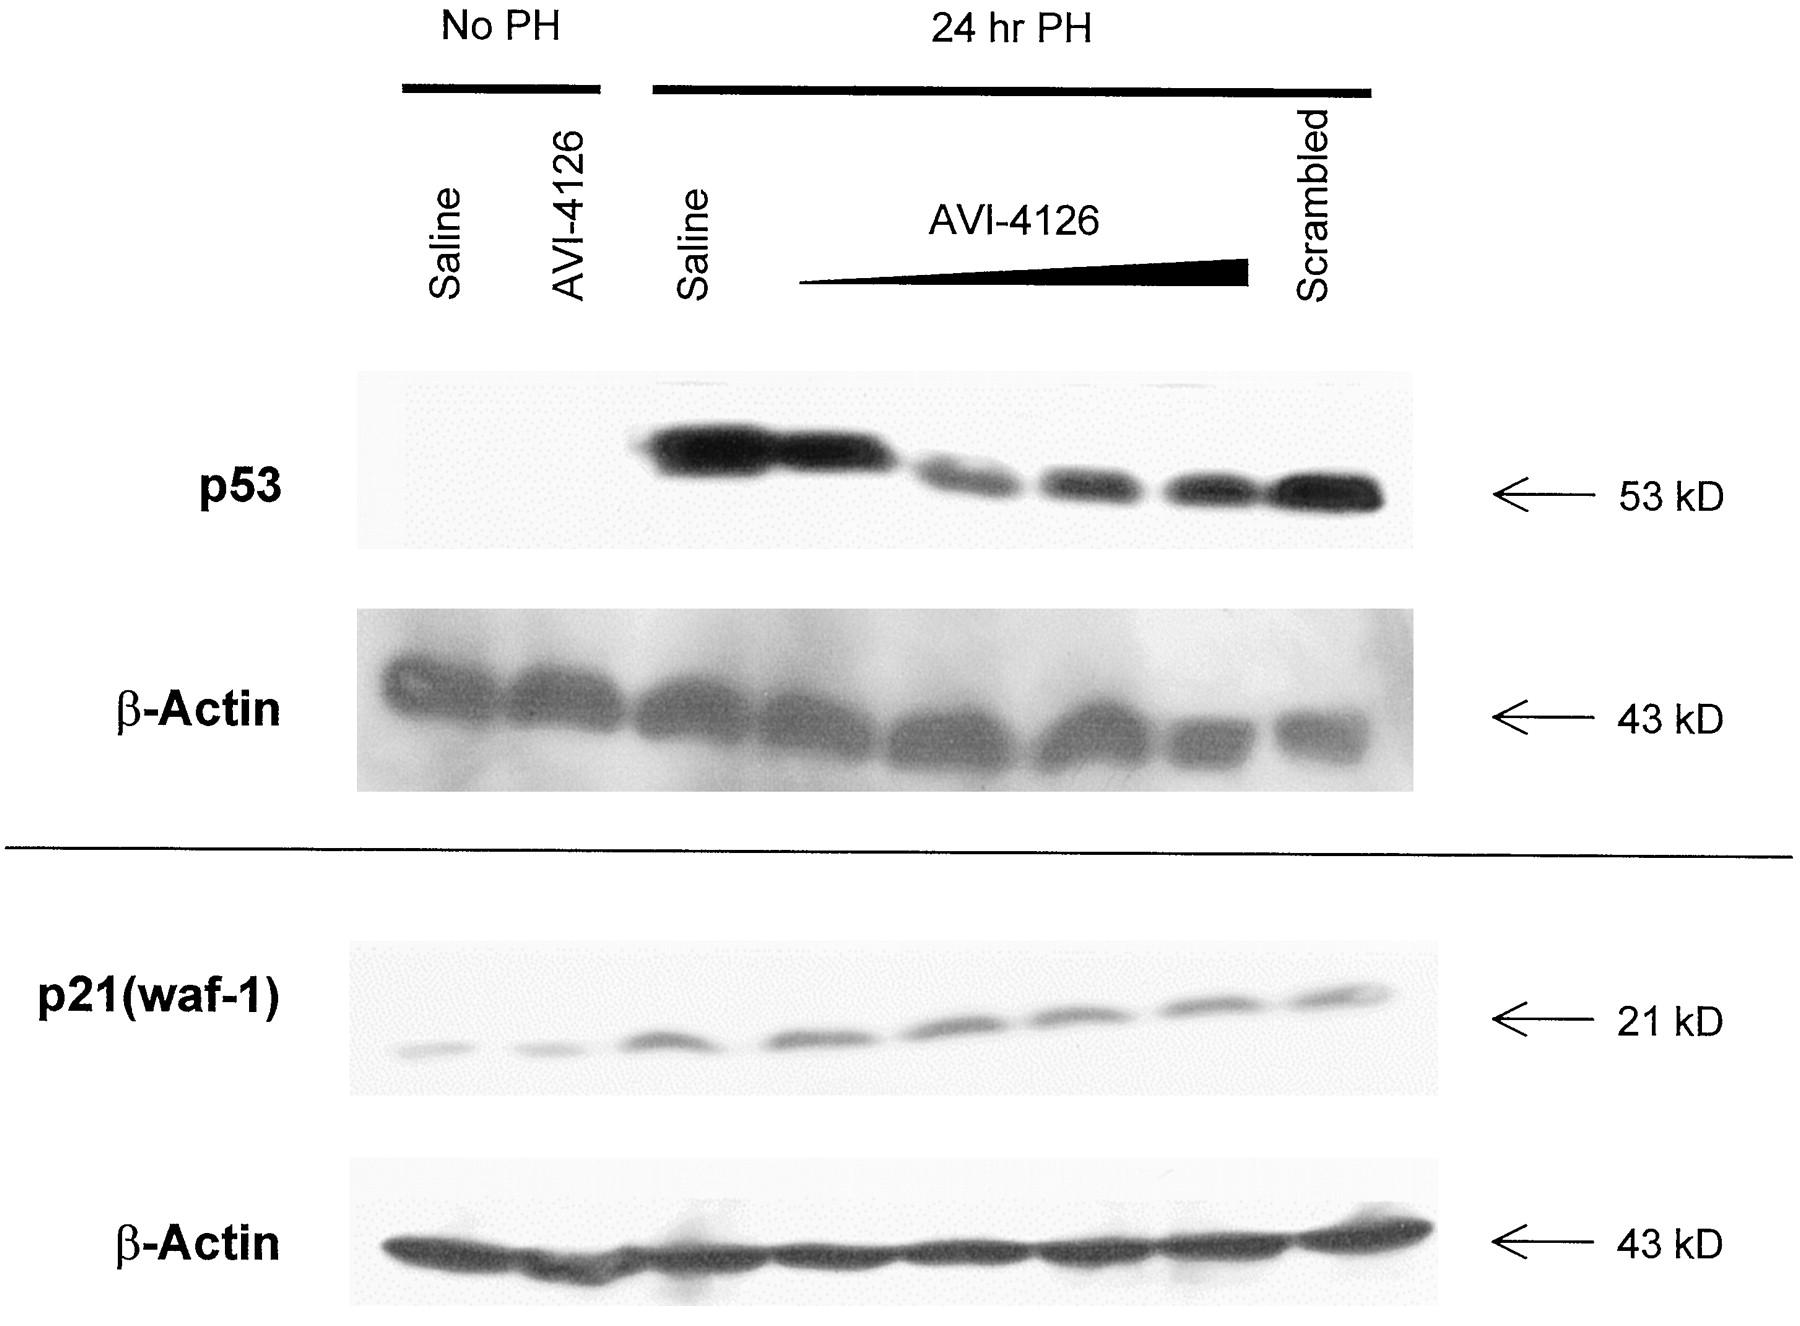 c-Myc Antisense Limits Rat Liver Regeneration and Indicates Role for